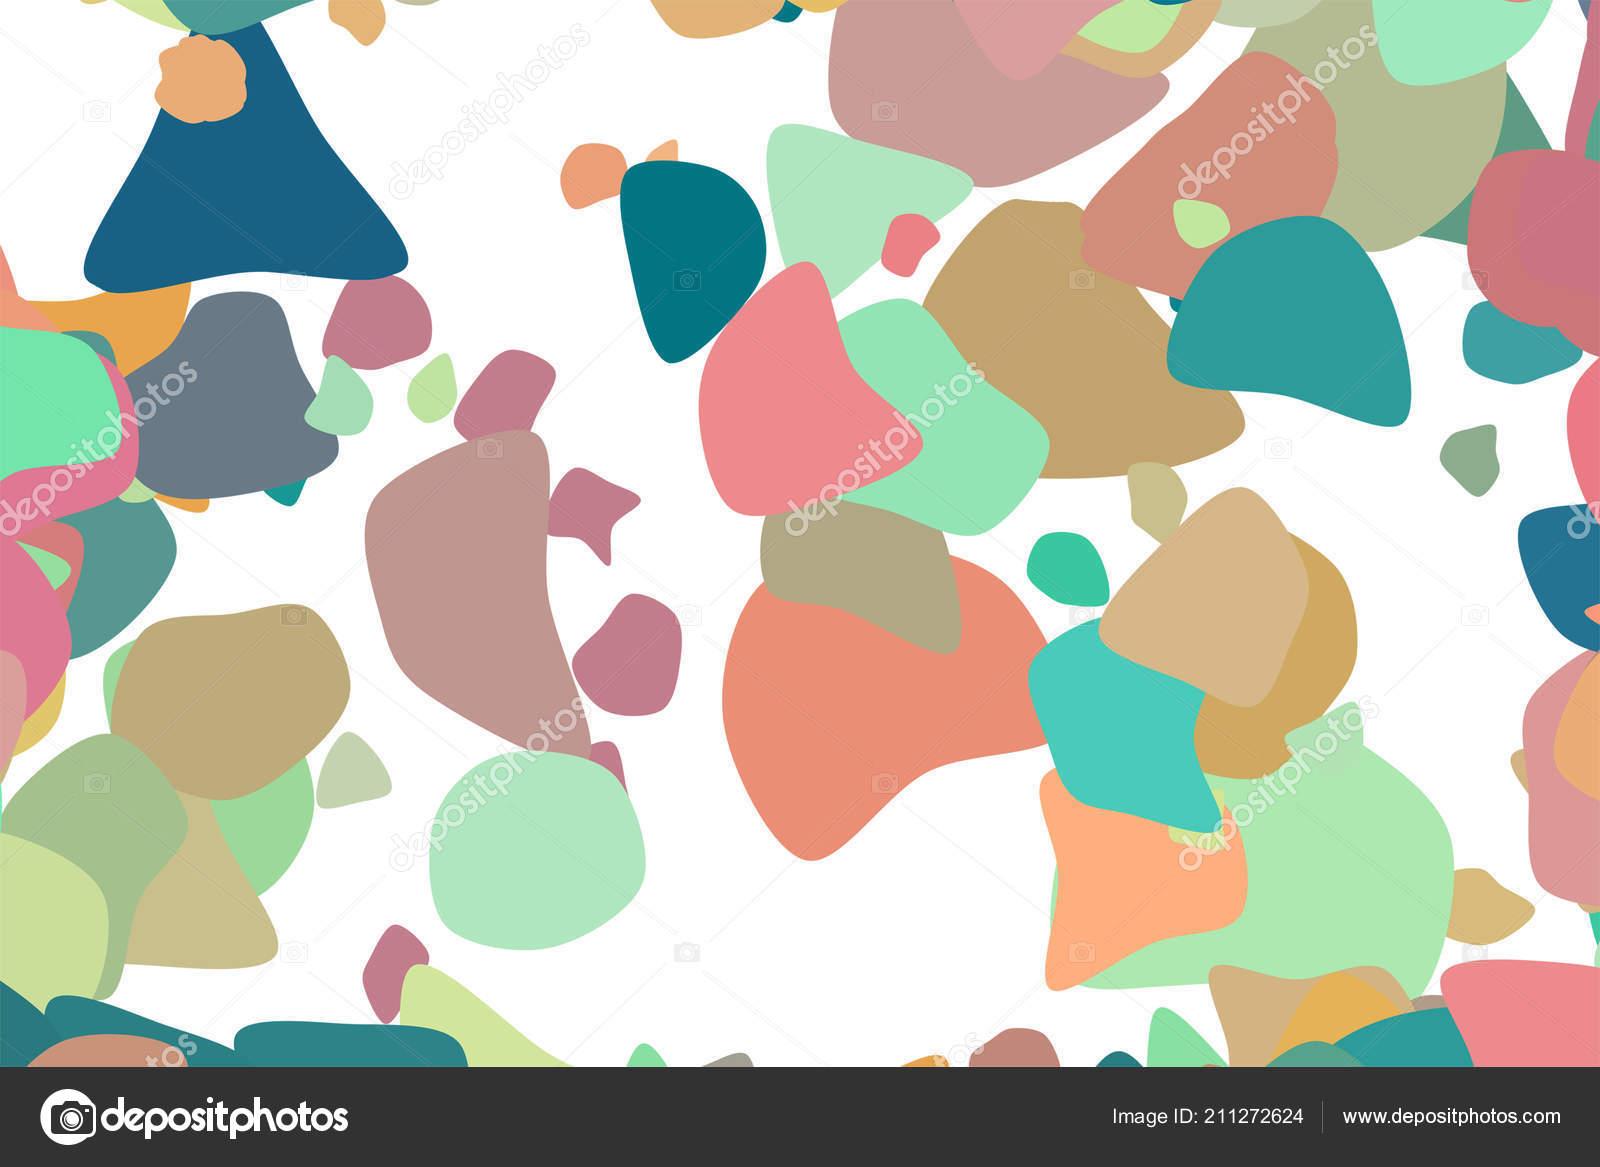 Shape Random Rounded Shapes Abstract Geometric Background